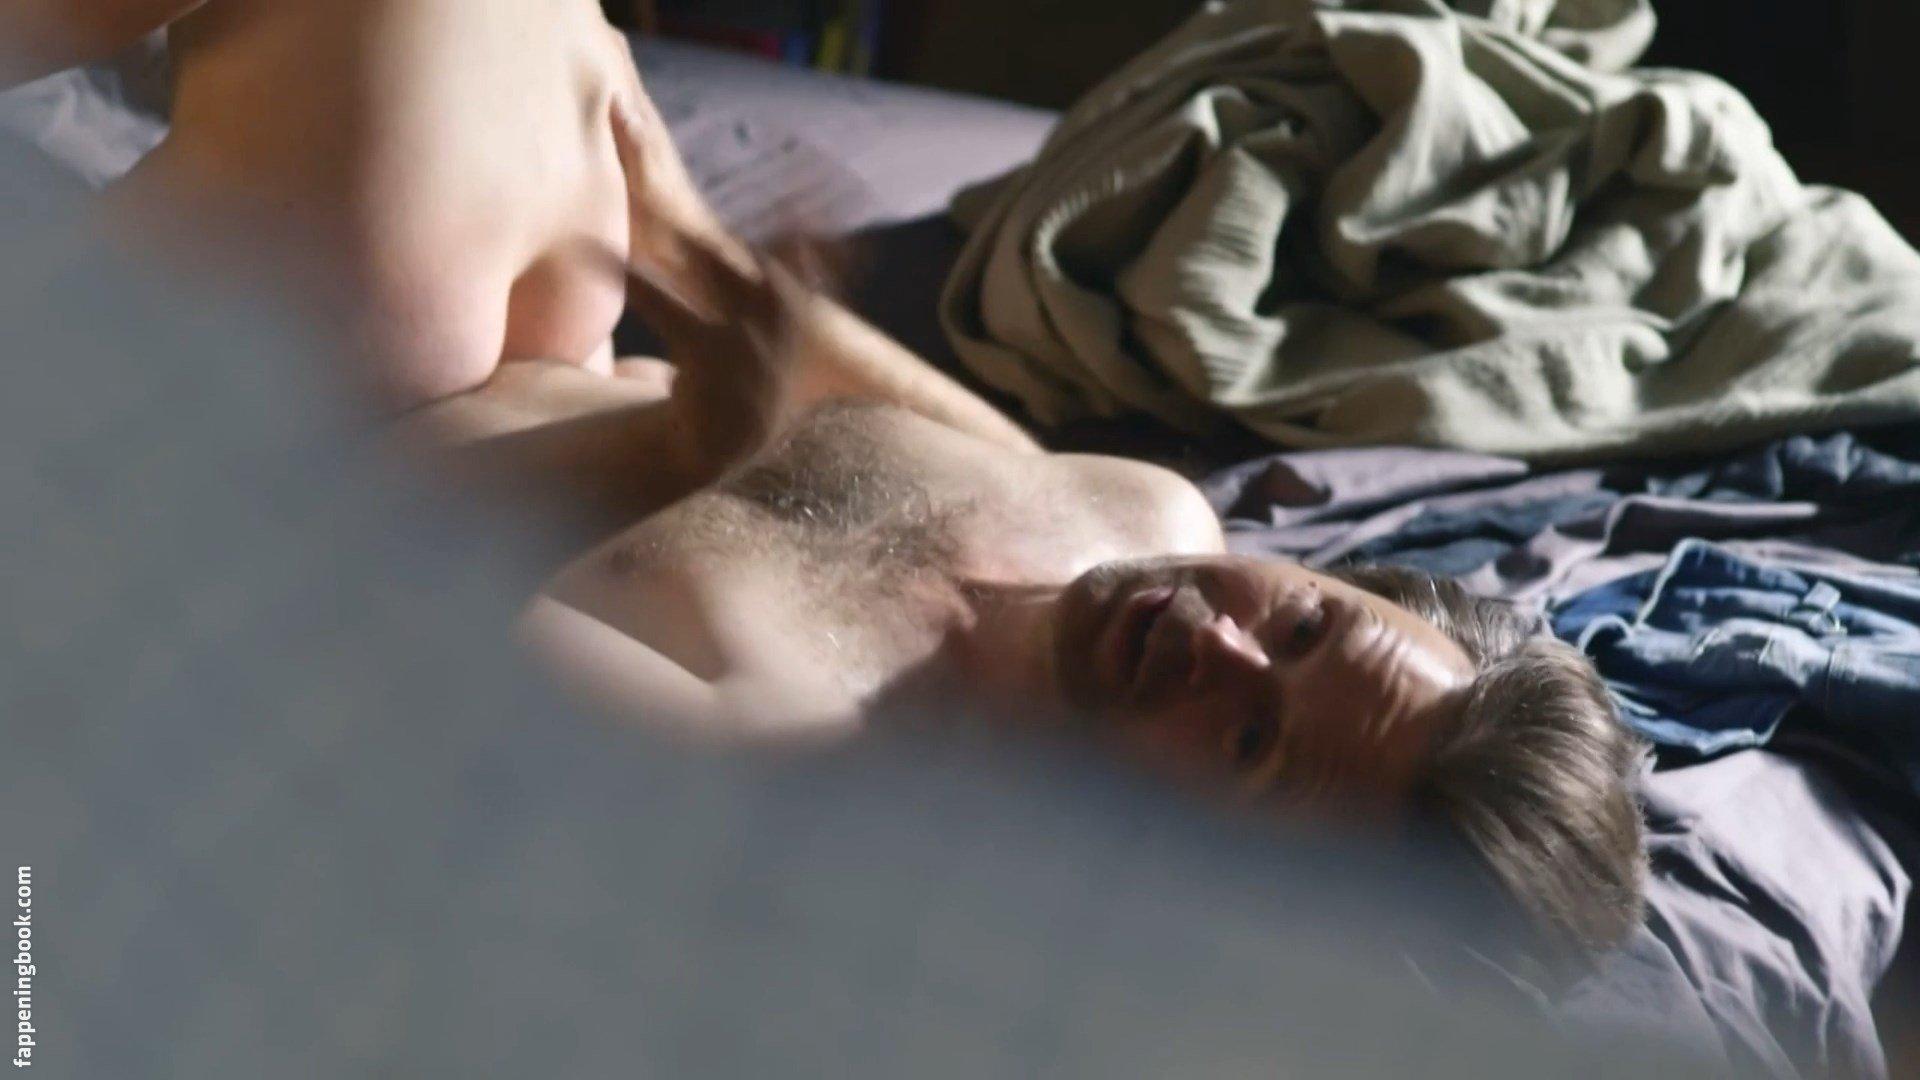 nackt Agedahl Berit Kostenloses nymphe